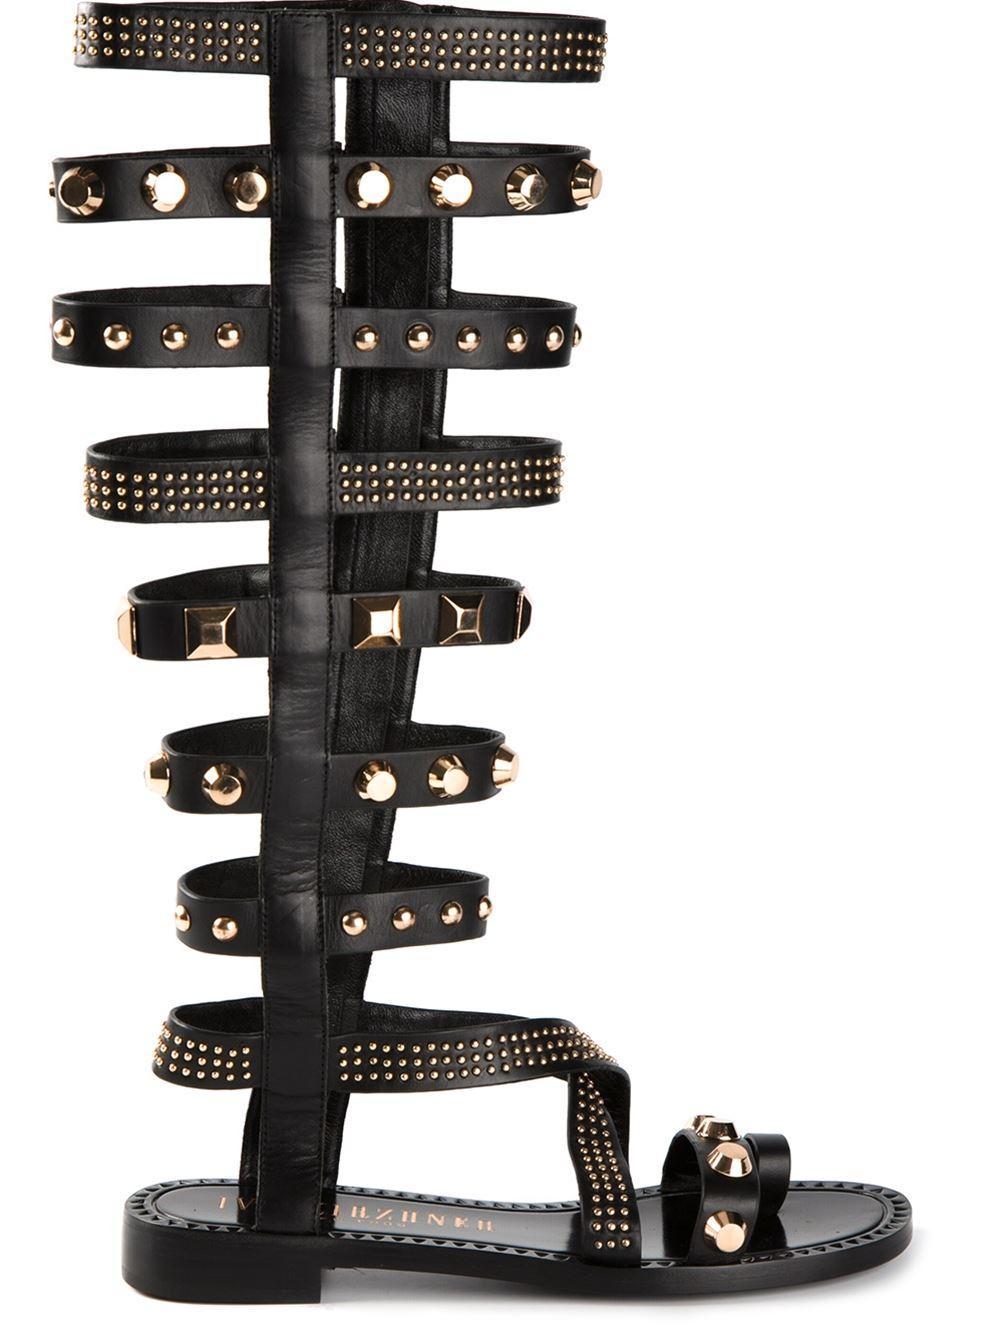 939ed604a73 Lyst - Ivy Kirzhner Triumph Studded Gladiator Sandals in Black